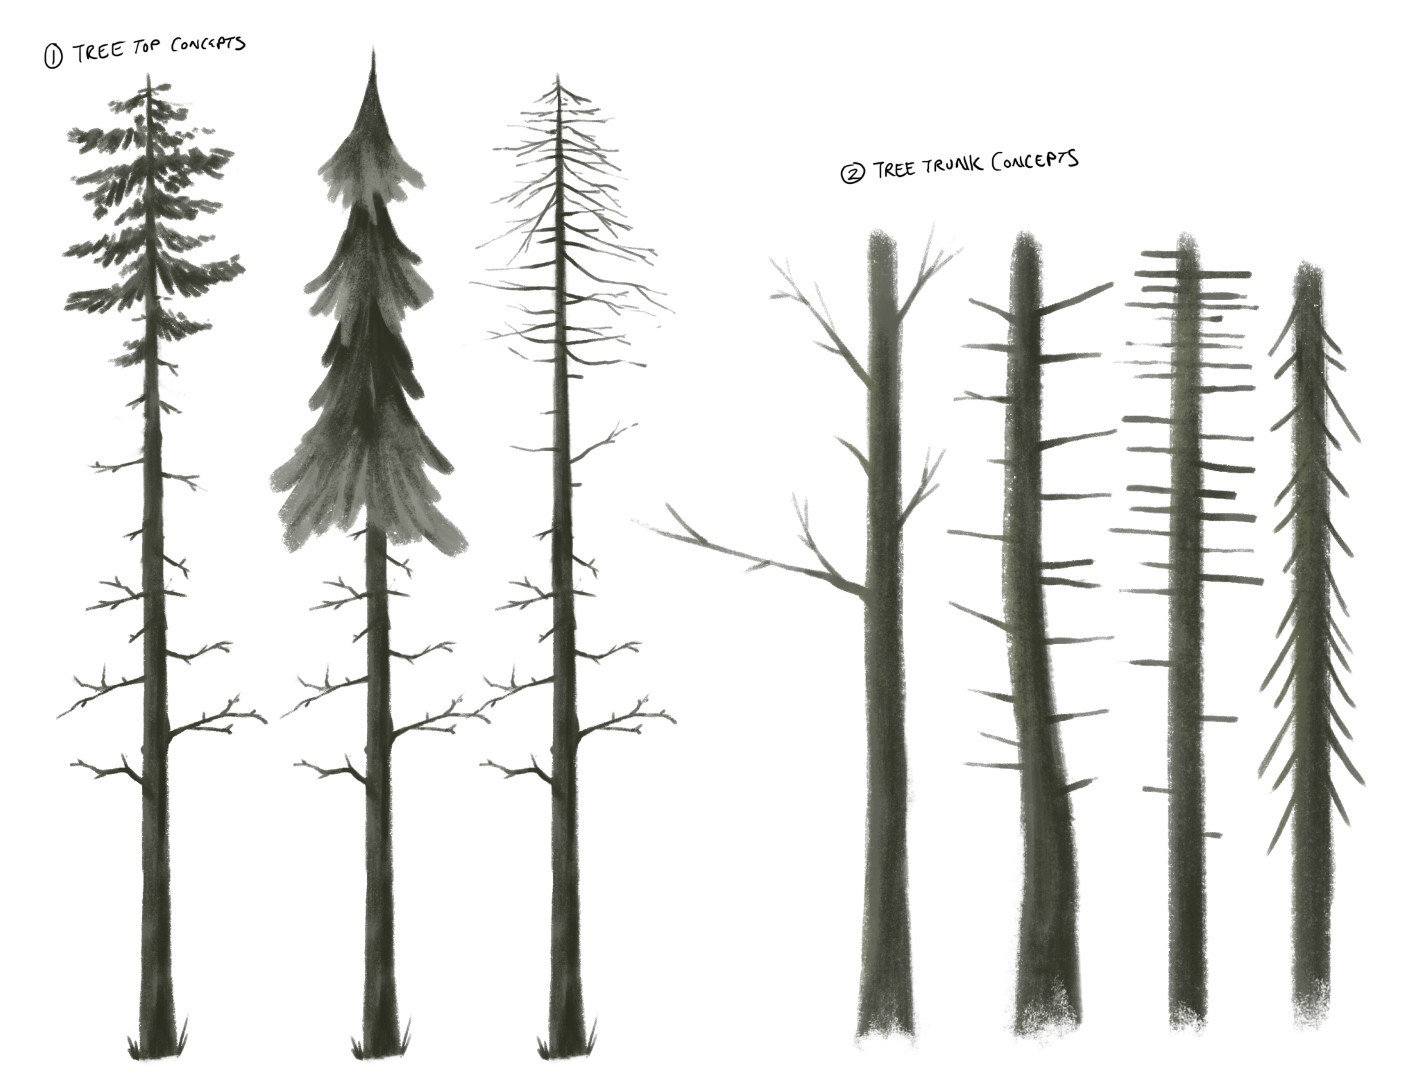 Ethan yazel imagebrew sketch trees 01 large